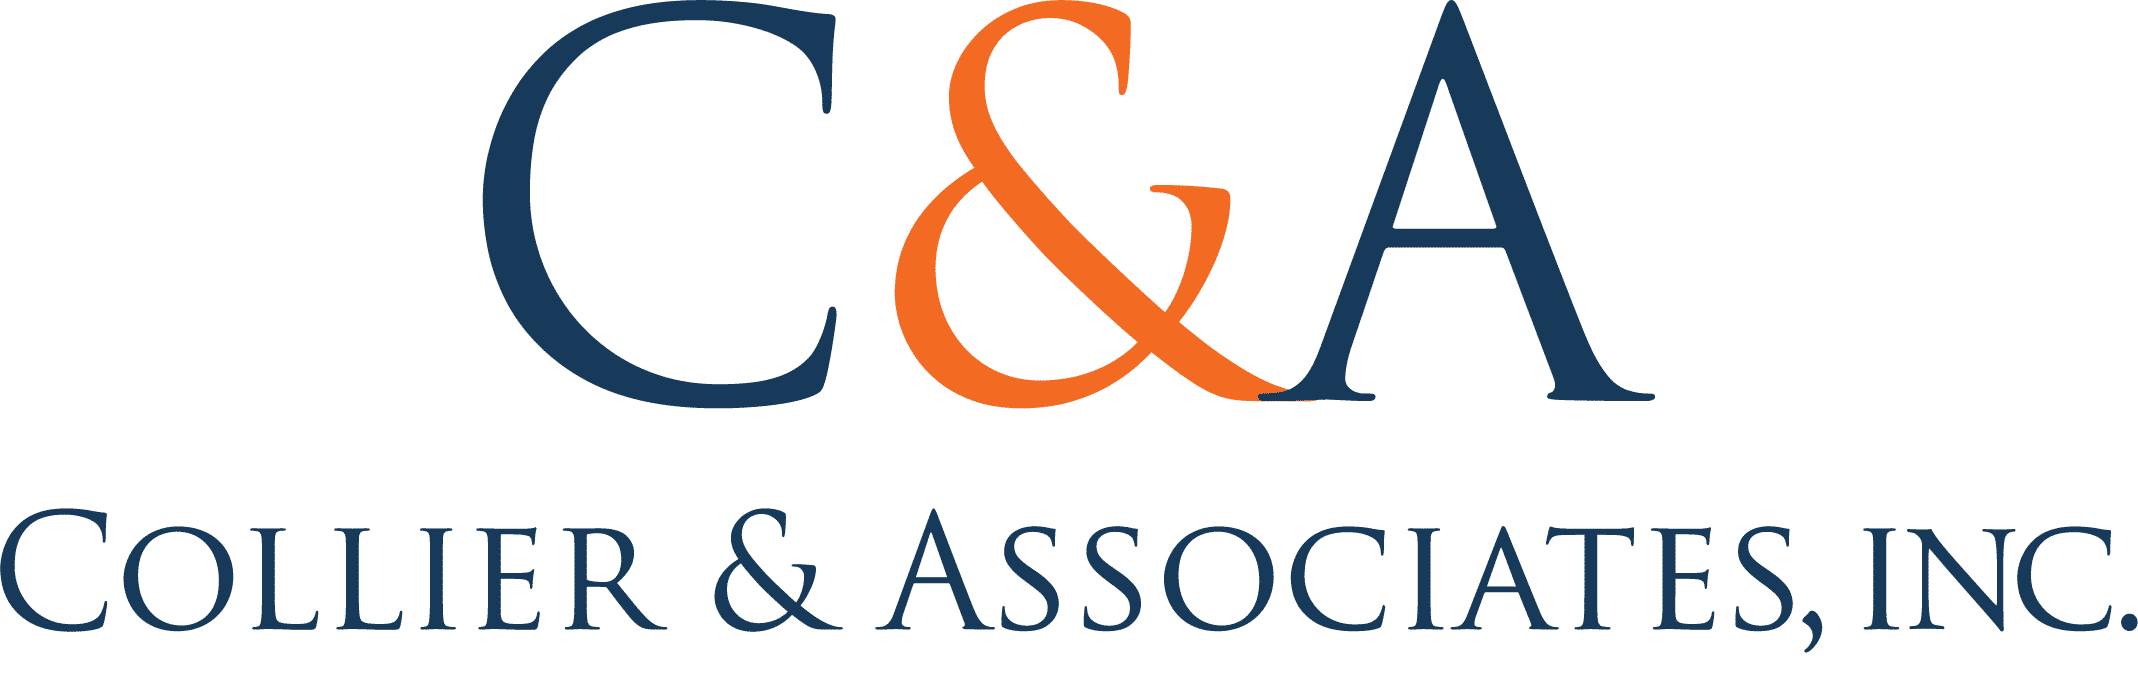 Collier & Associates, Inc.